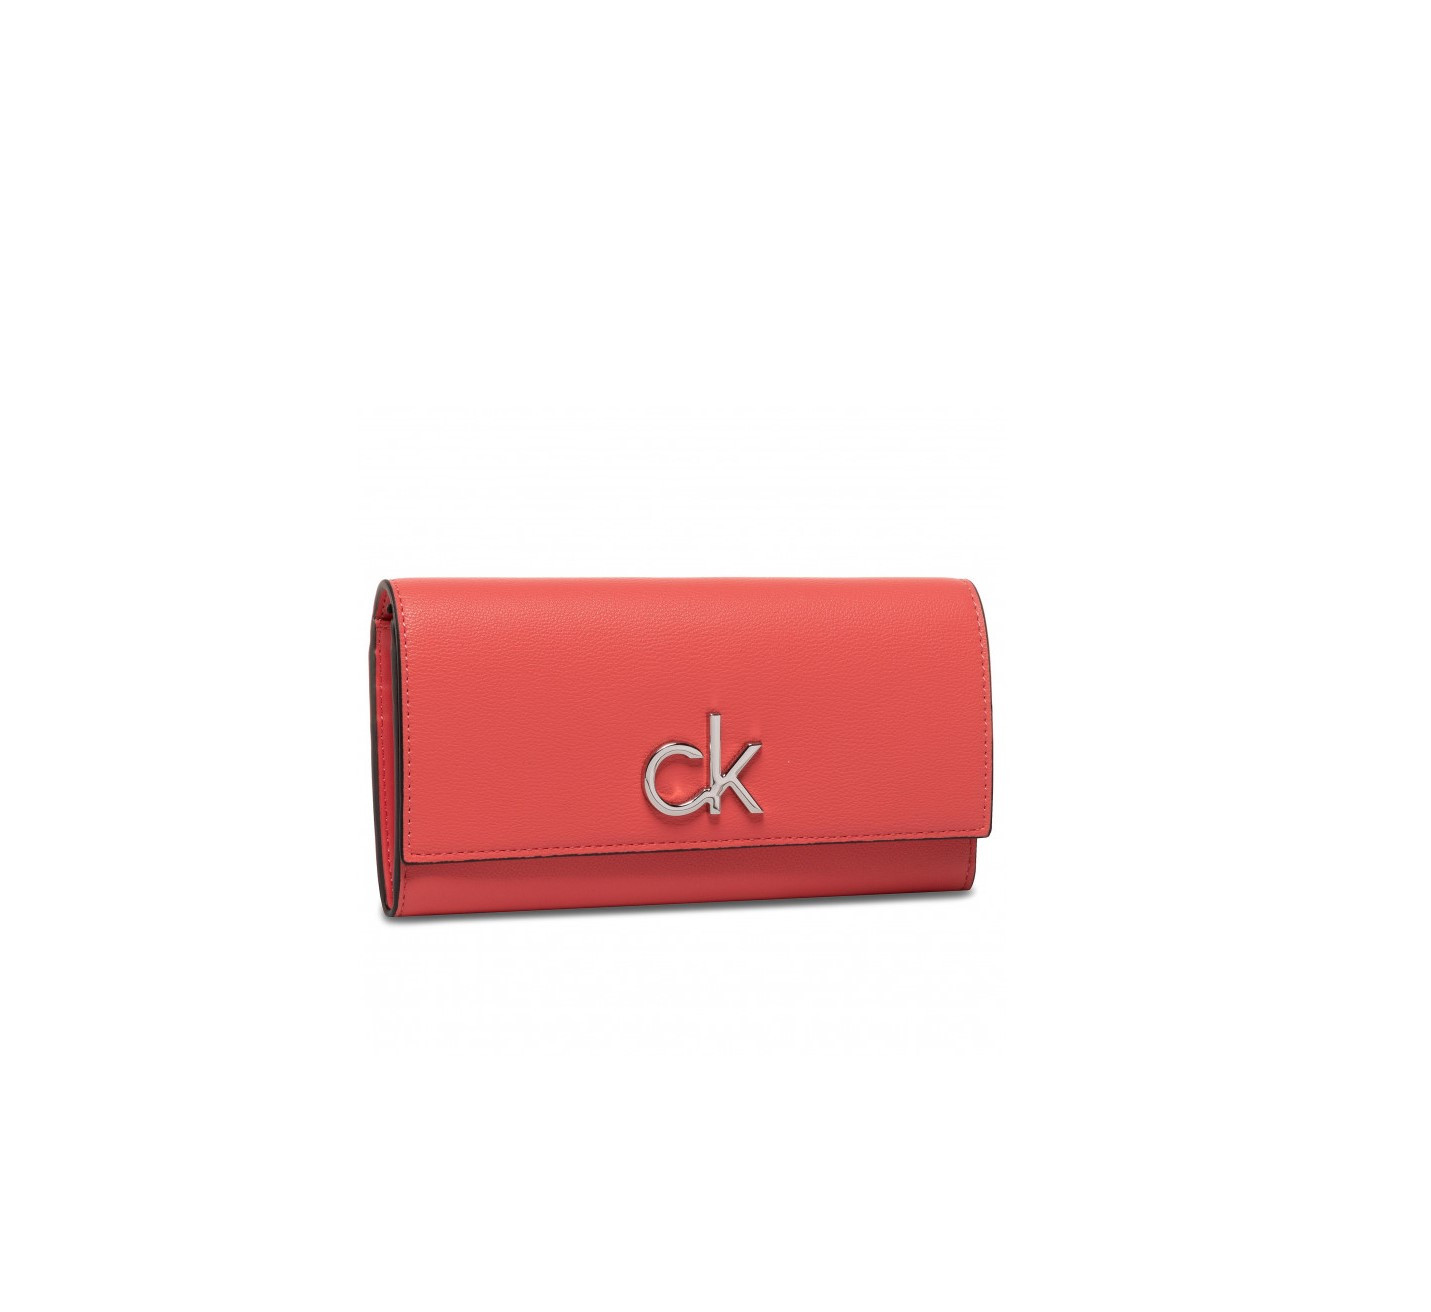 Calvin Klein Calvin Klein dámská korálová peněženka s klopou